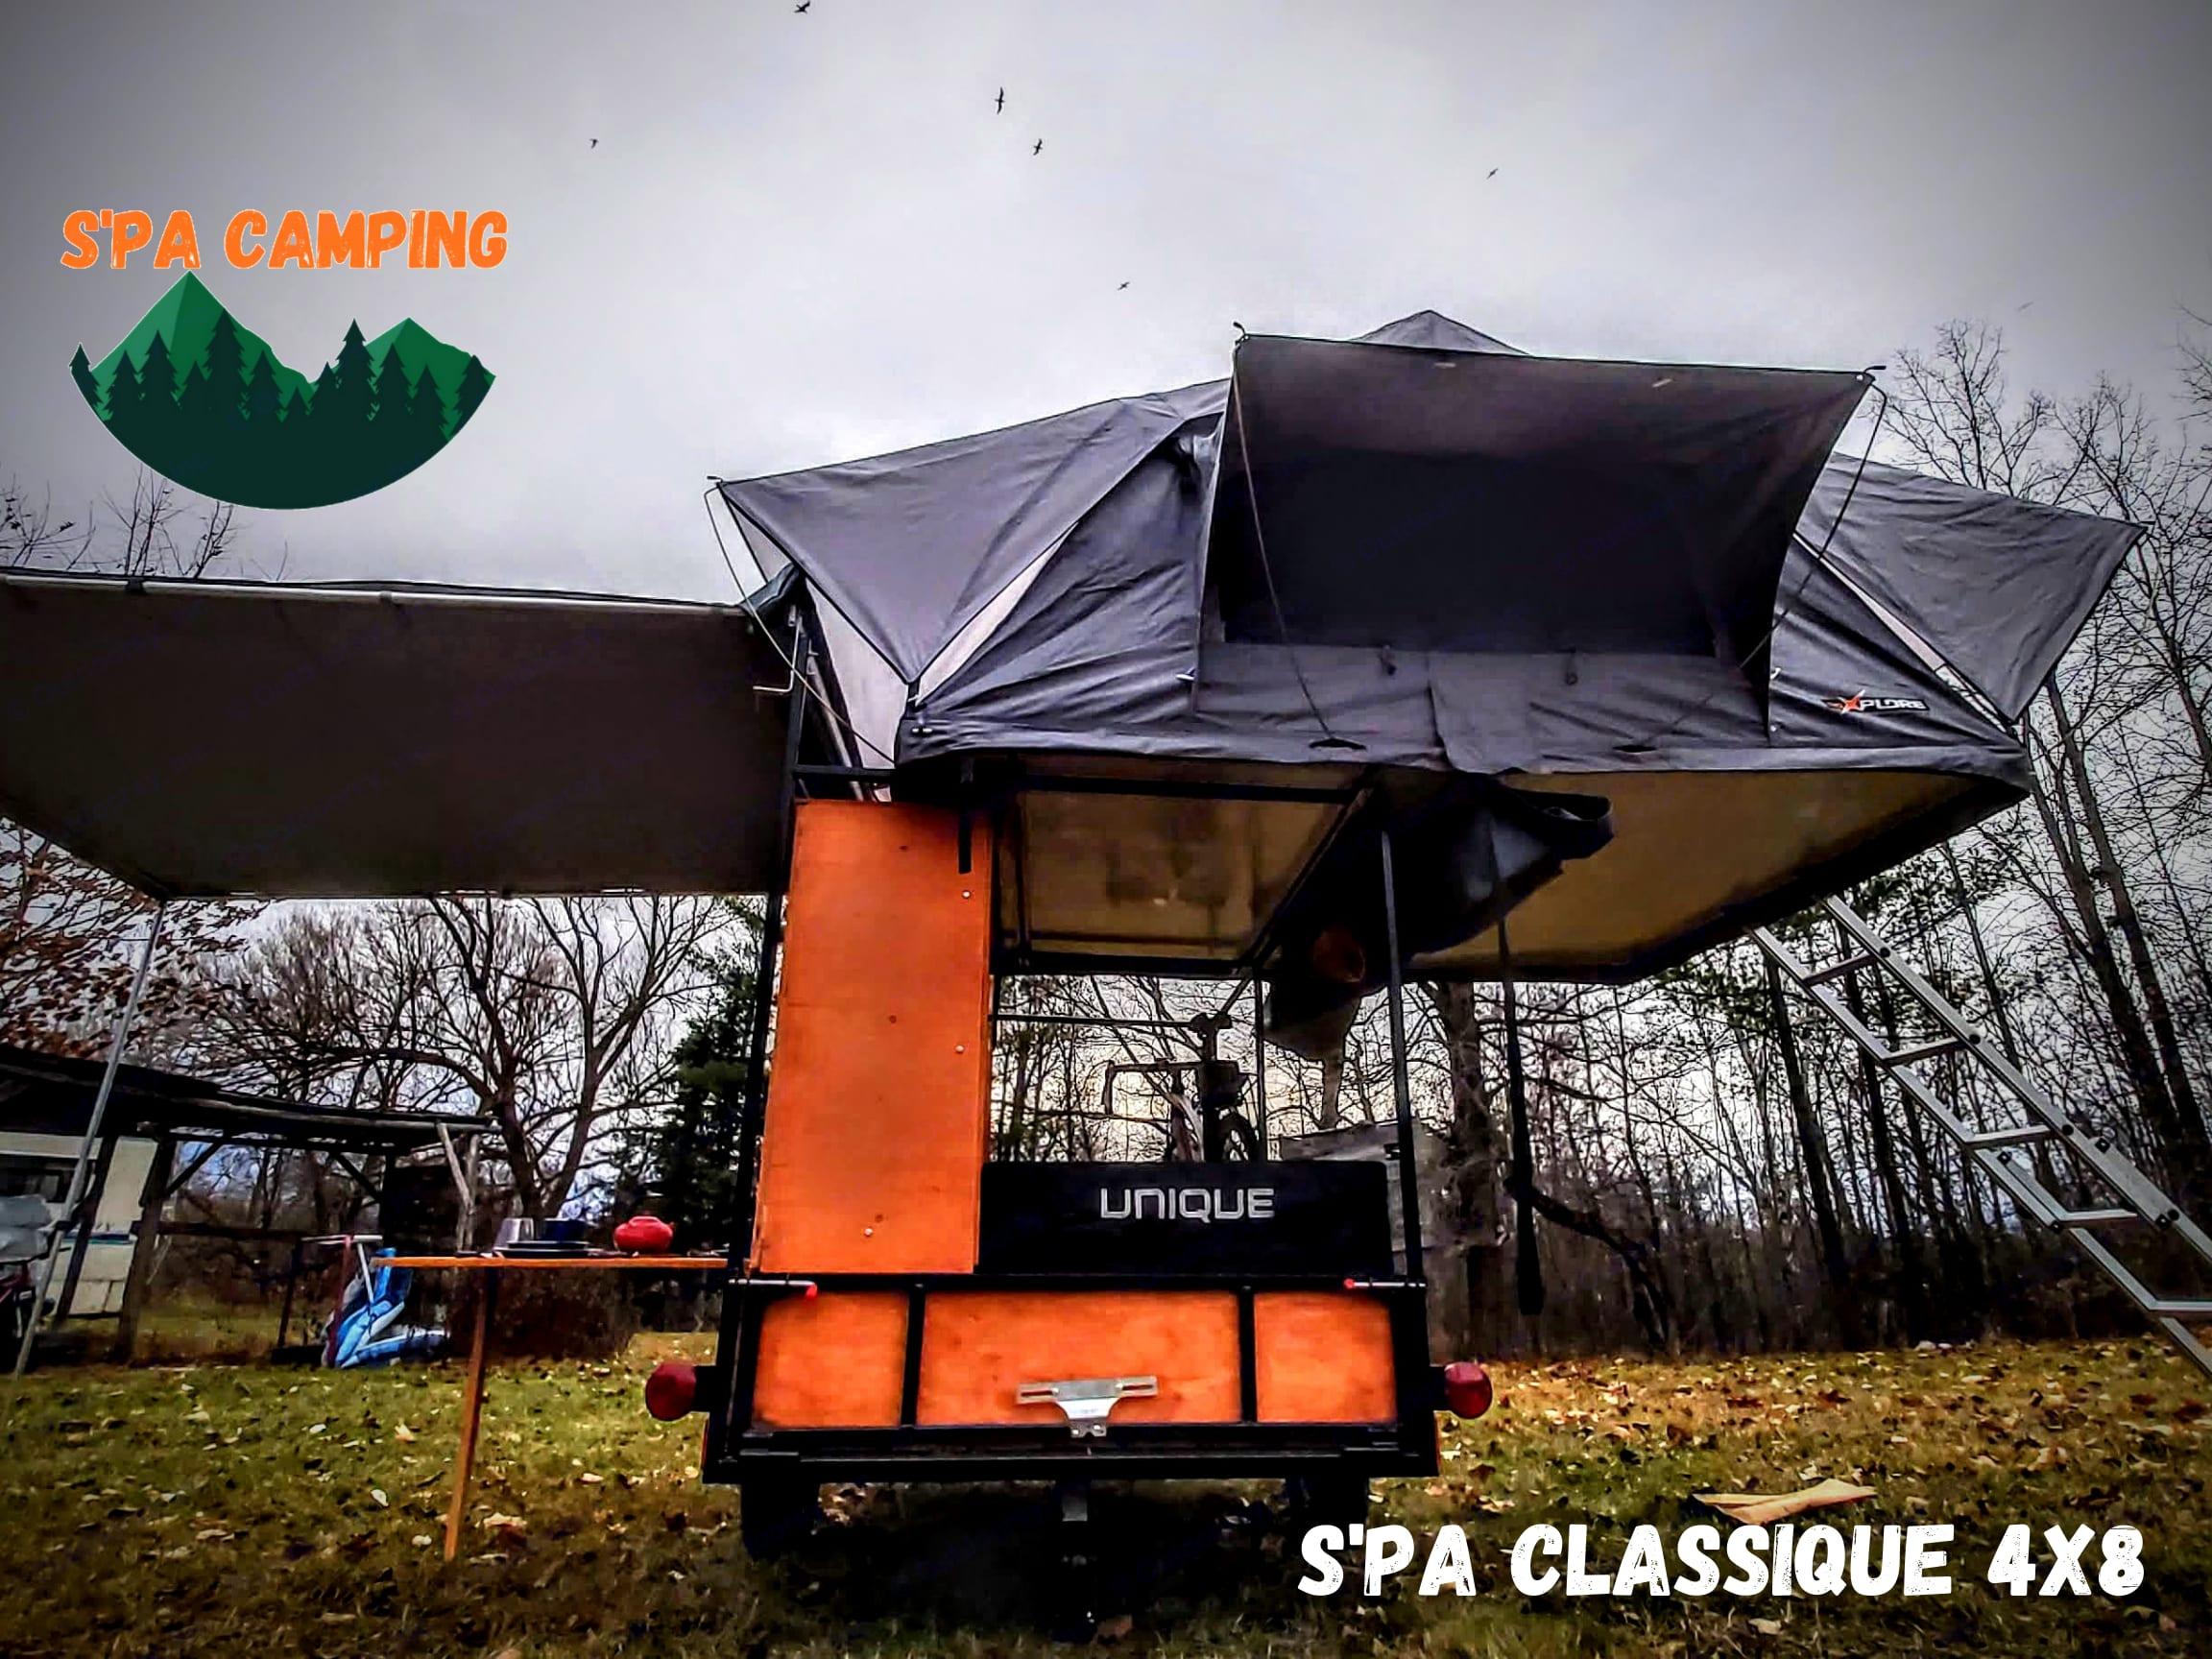 S'PA camping classique 2021